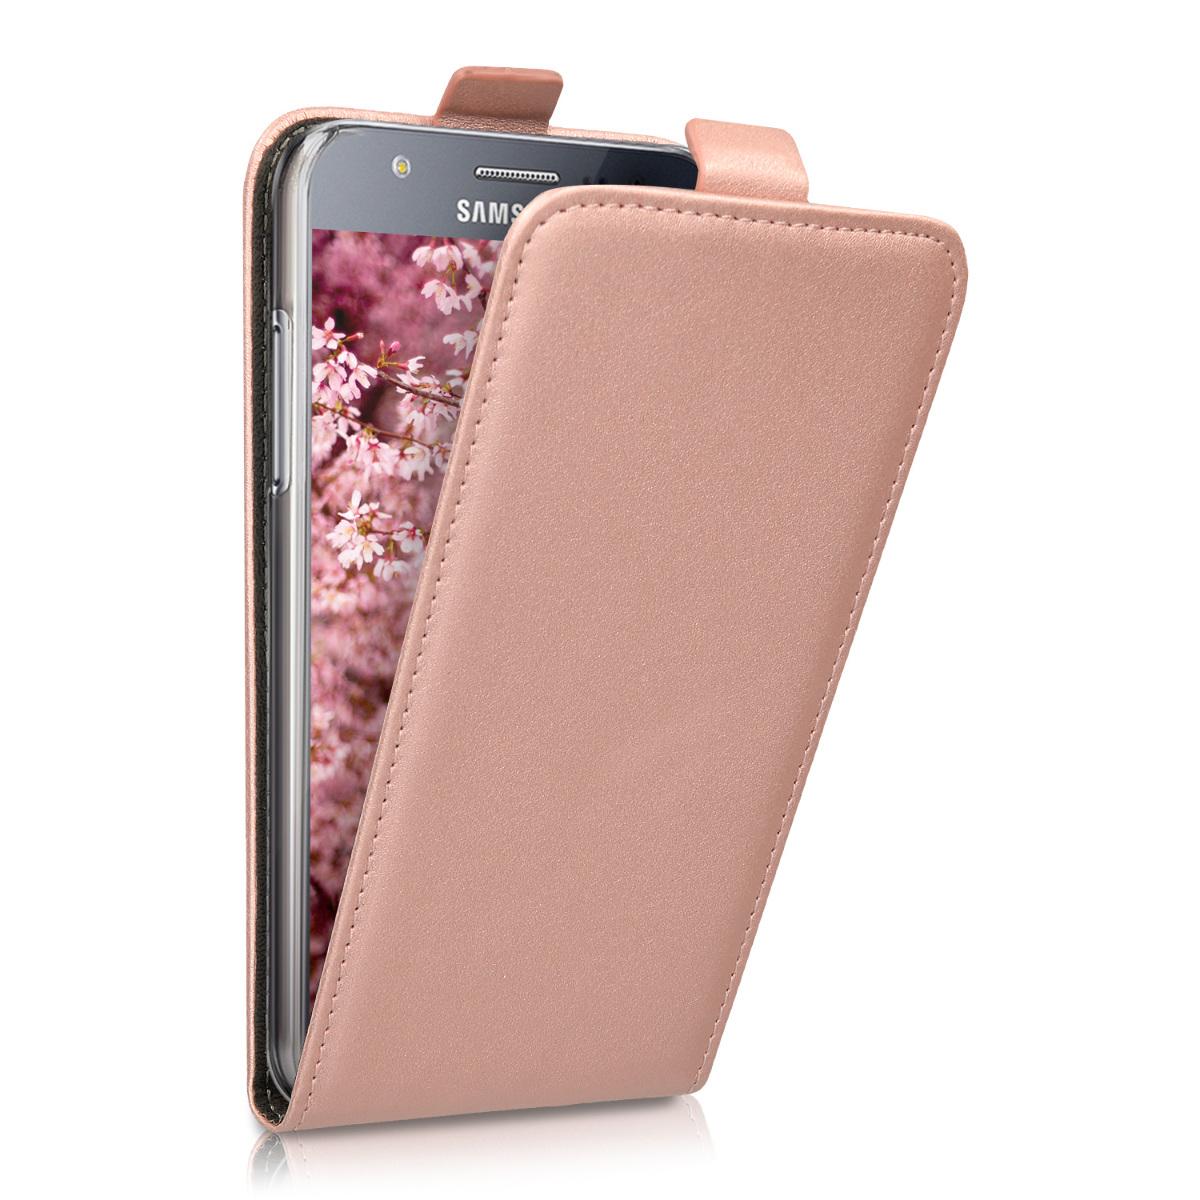 Hulle-fur-Samsung-Galaxy-J5-2015-Flip-Handyhulle-Handy-Case-Cover-Schutzhulle